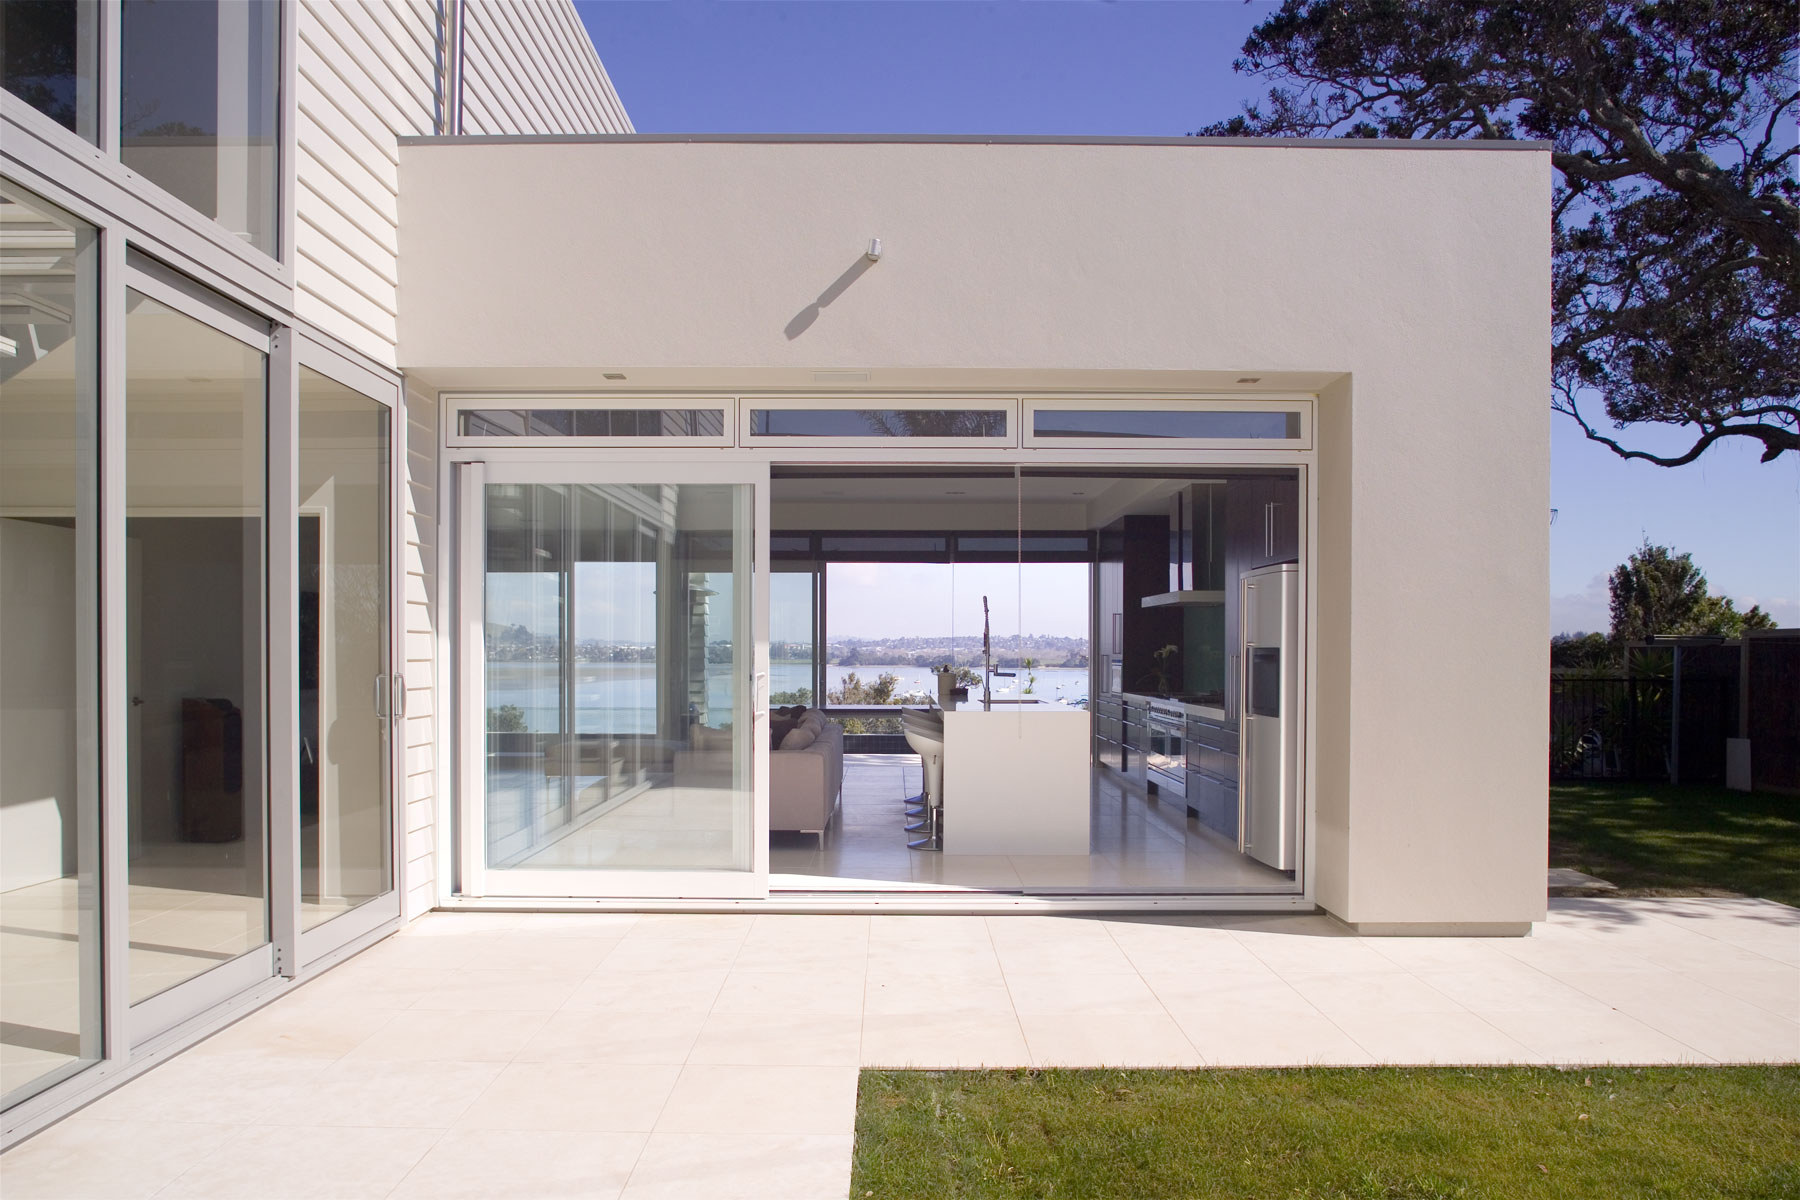 C Leuschke Kahn Architects_CompassPt LKA_F2J94386.jpg